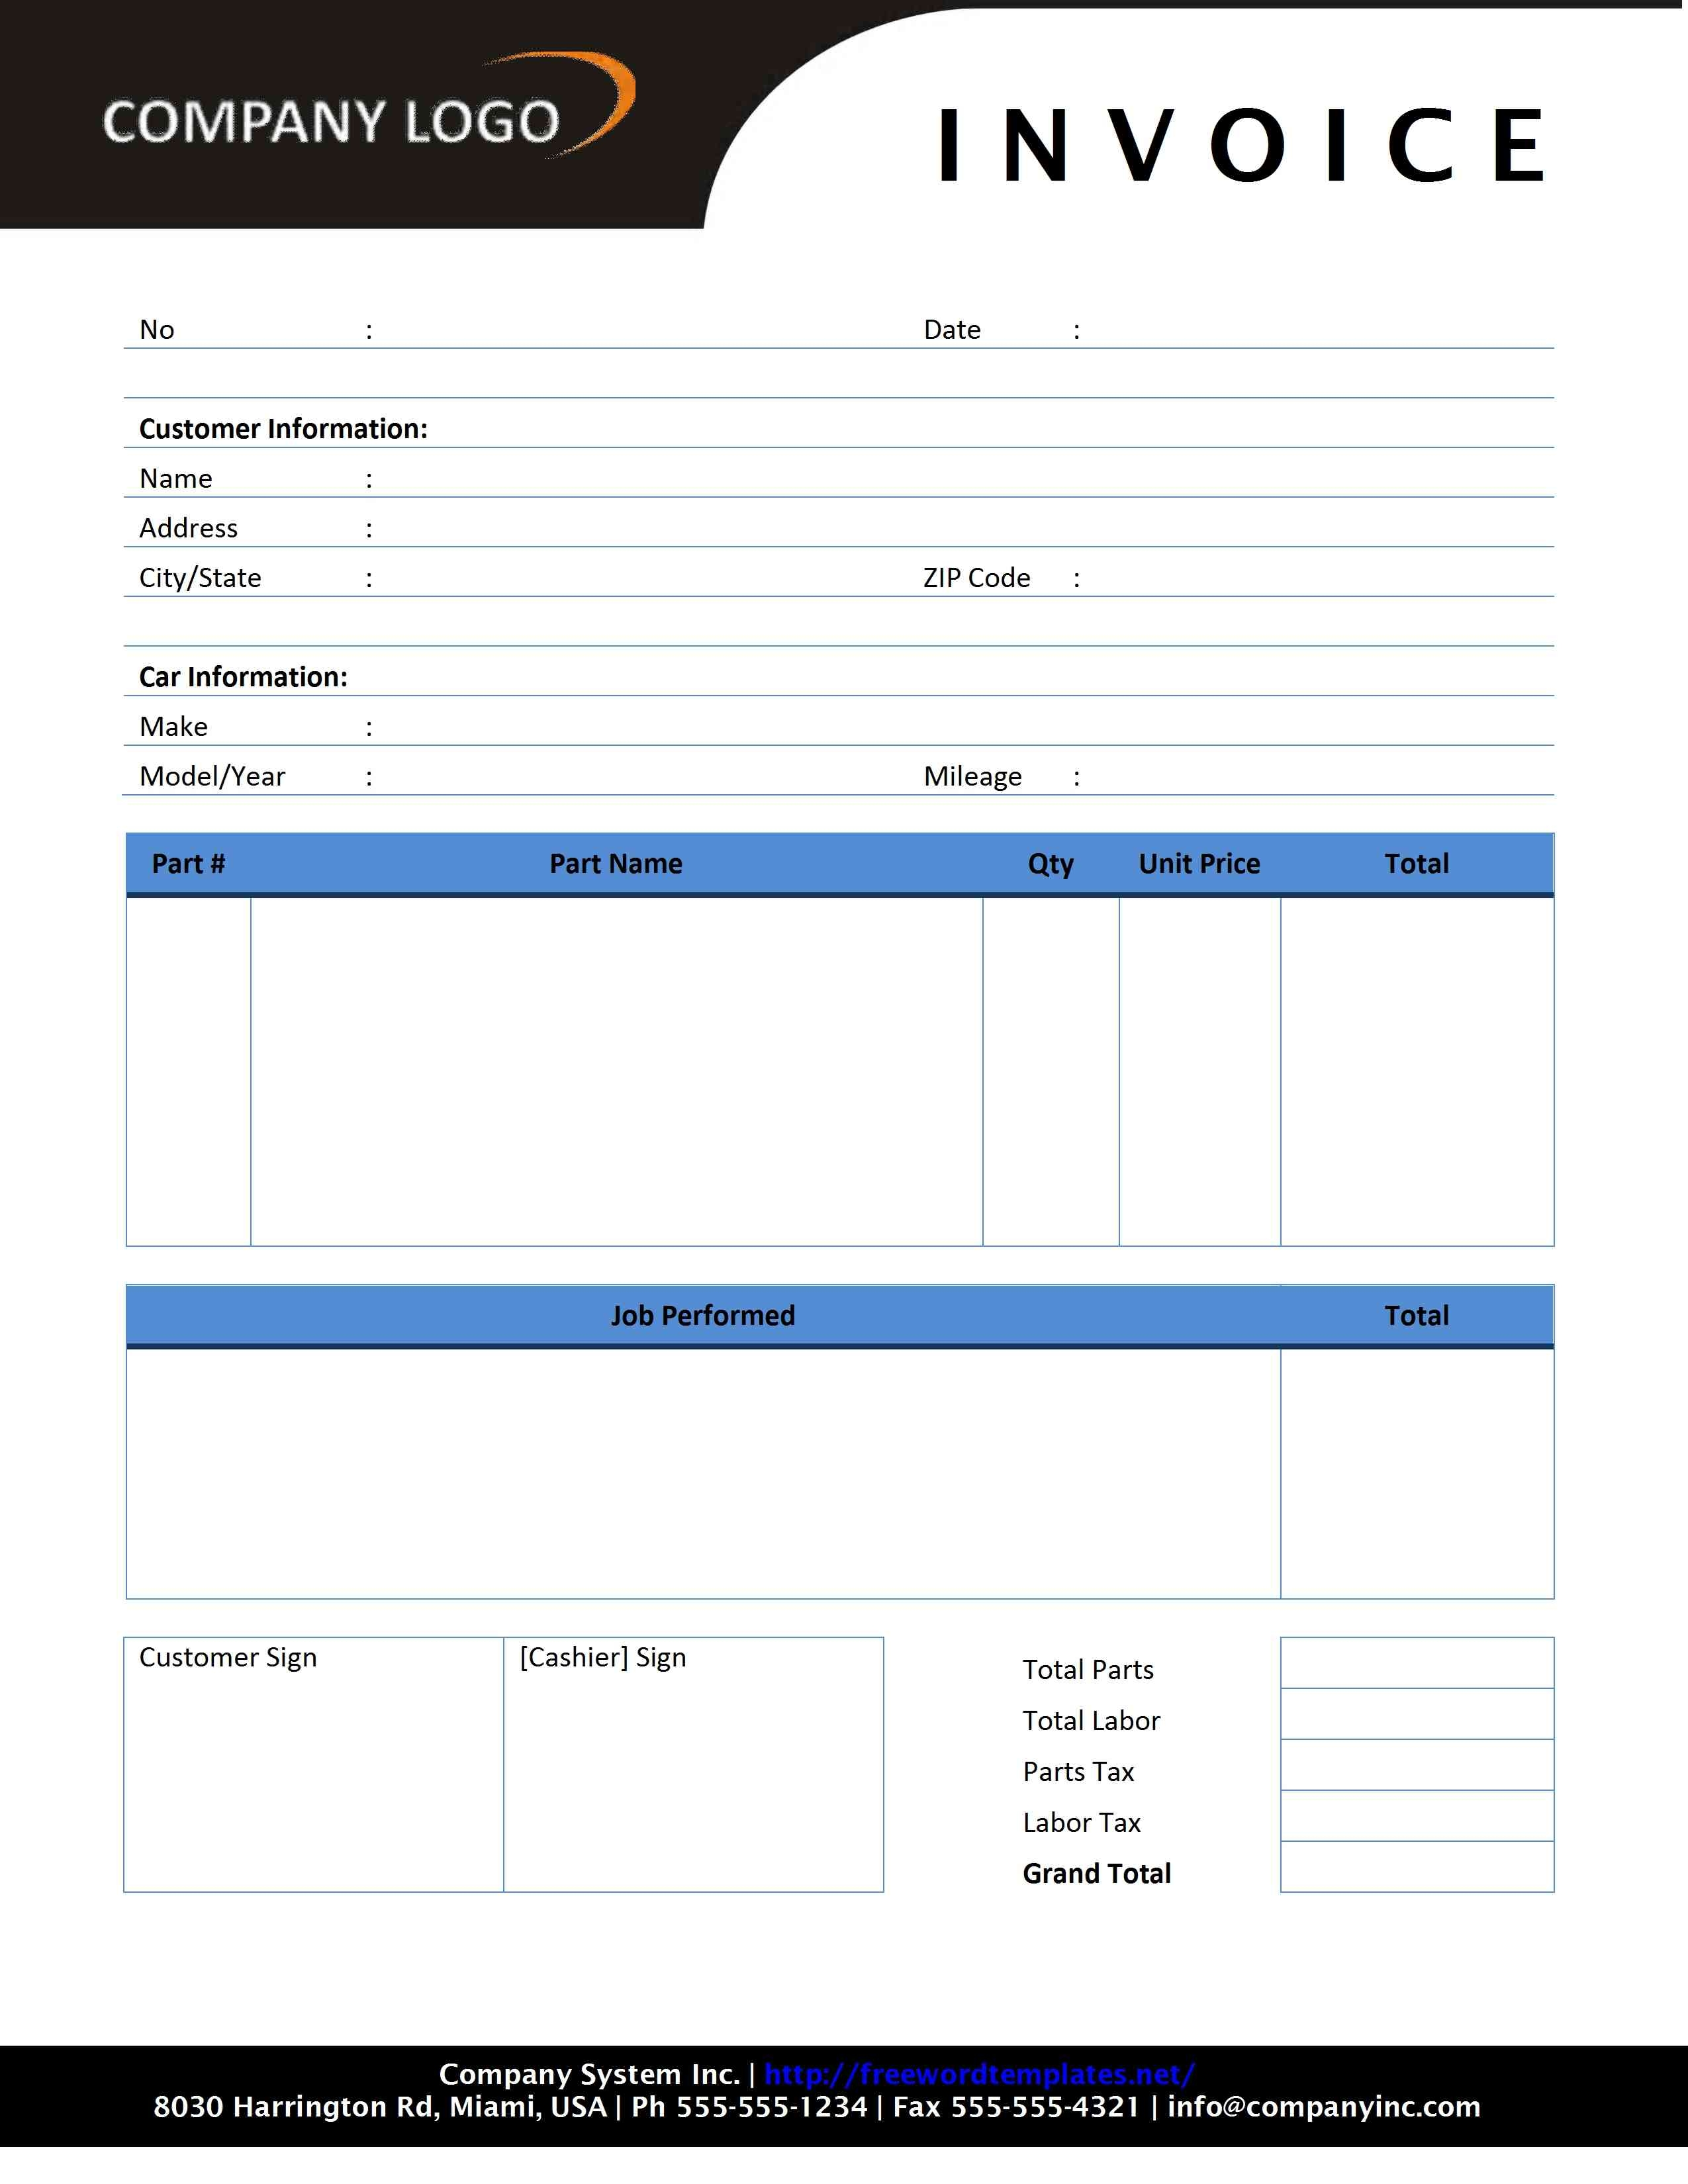 auto shop invoice template invoice template ideas. Black Bedroom Furniture Sets. Home Design Ideas